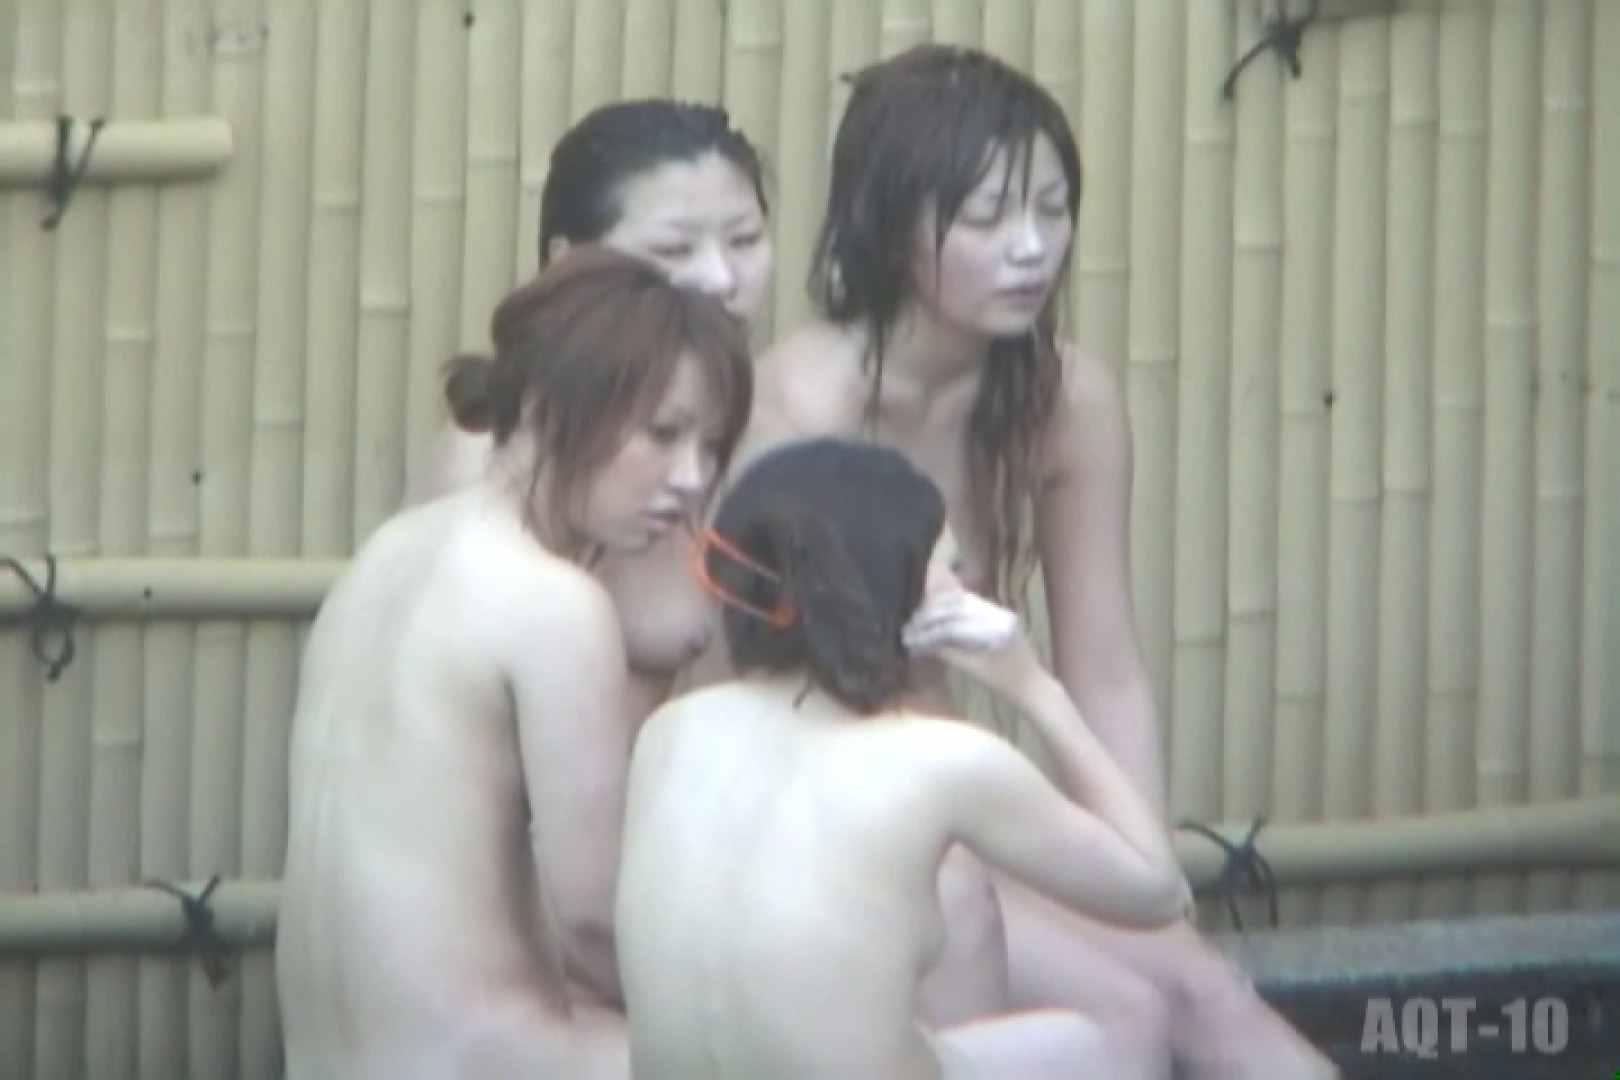 Aquaな露天風呂Vol.790 OLのプライベート  13pic 3